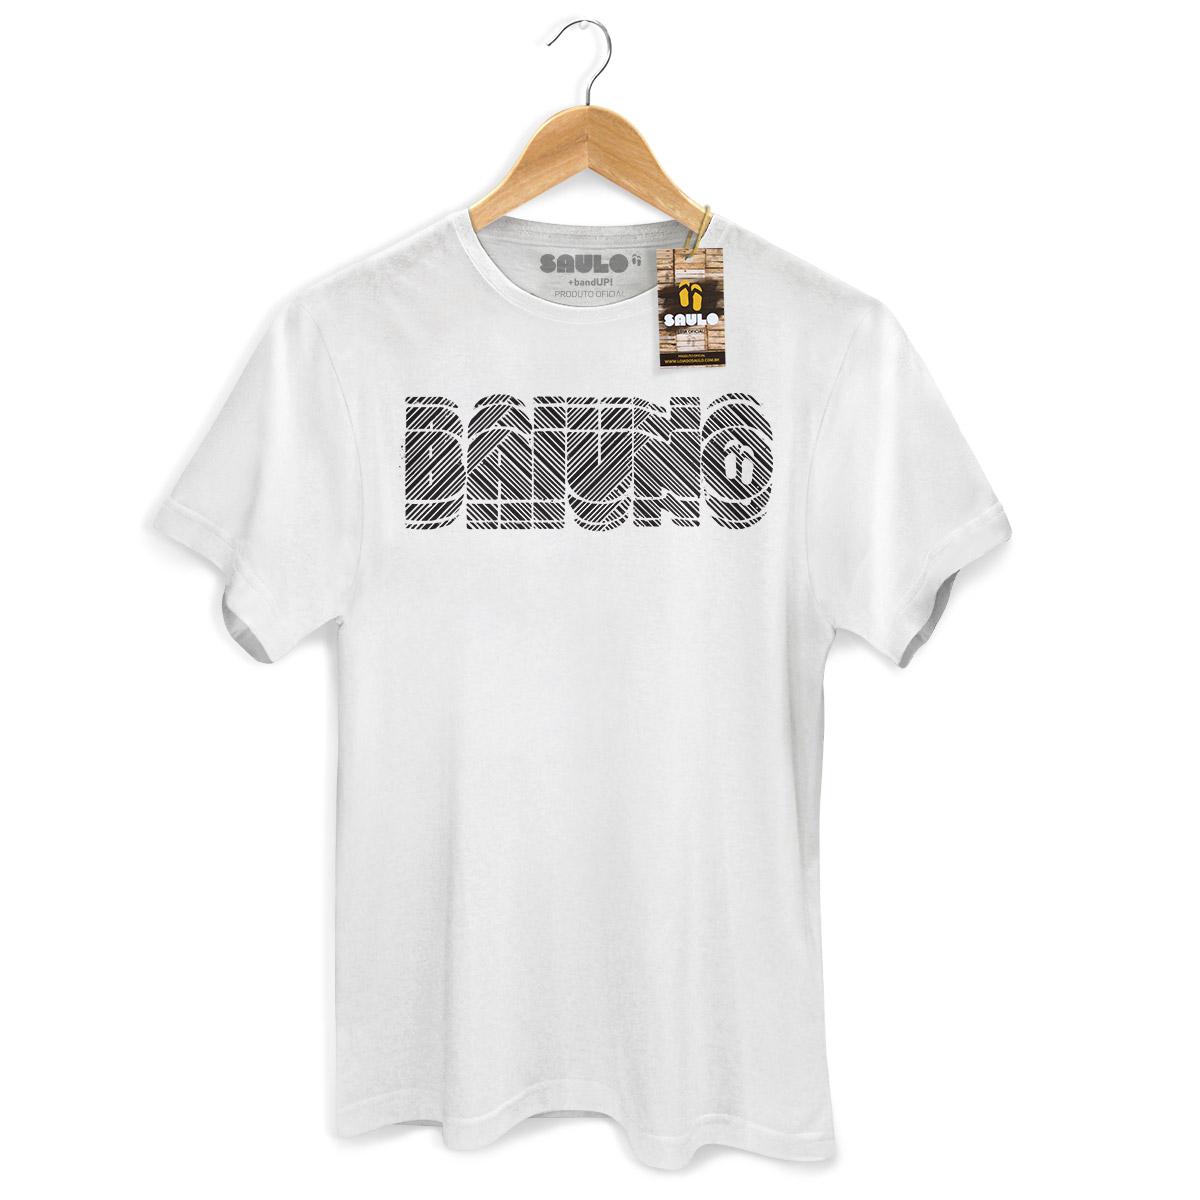 Camiseta Masculina Saulo Baiuno